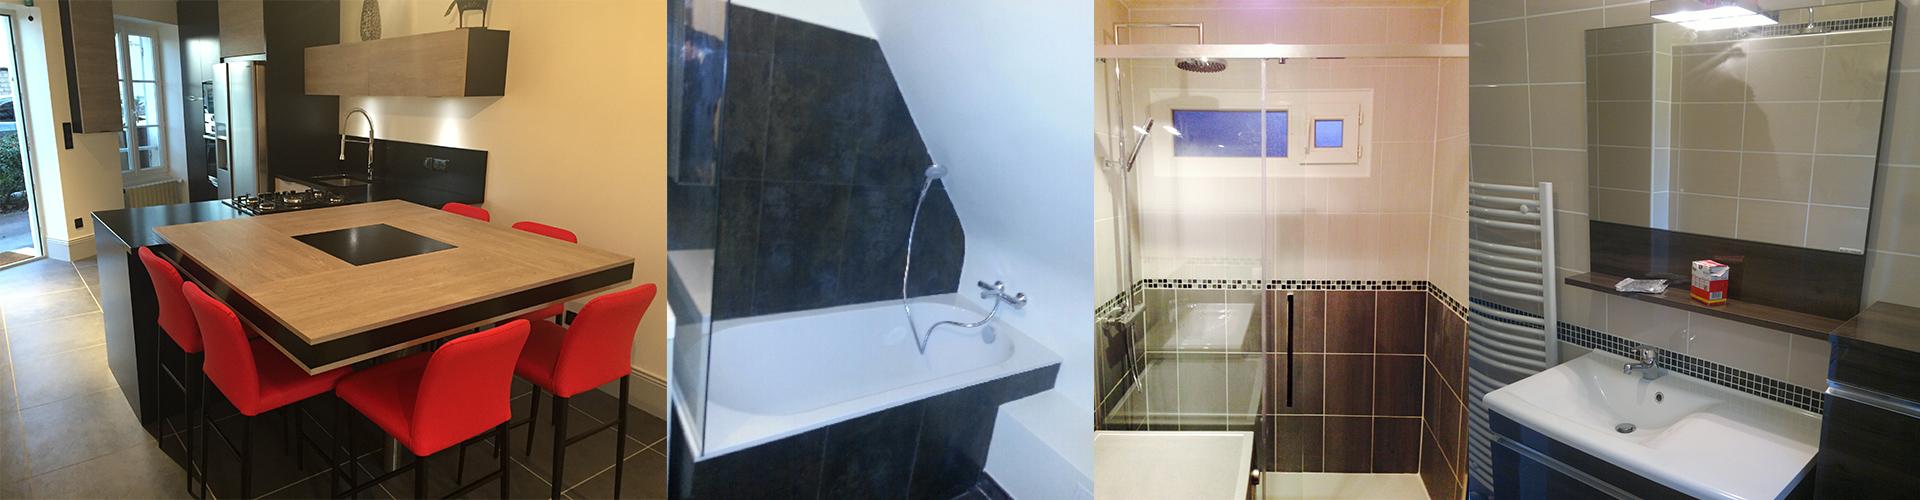 plomberie cuisine et salle de bain